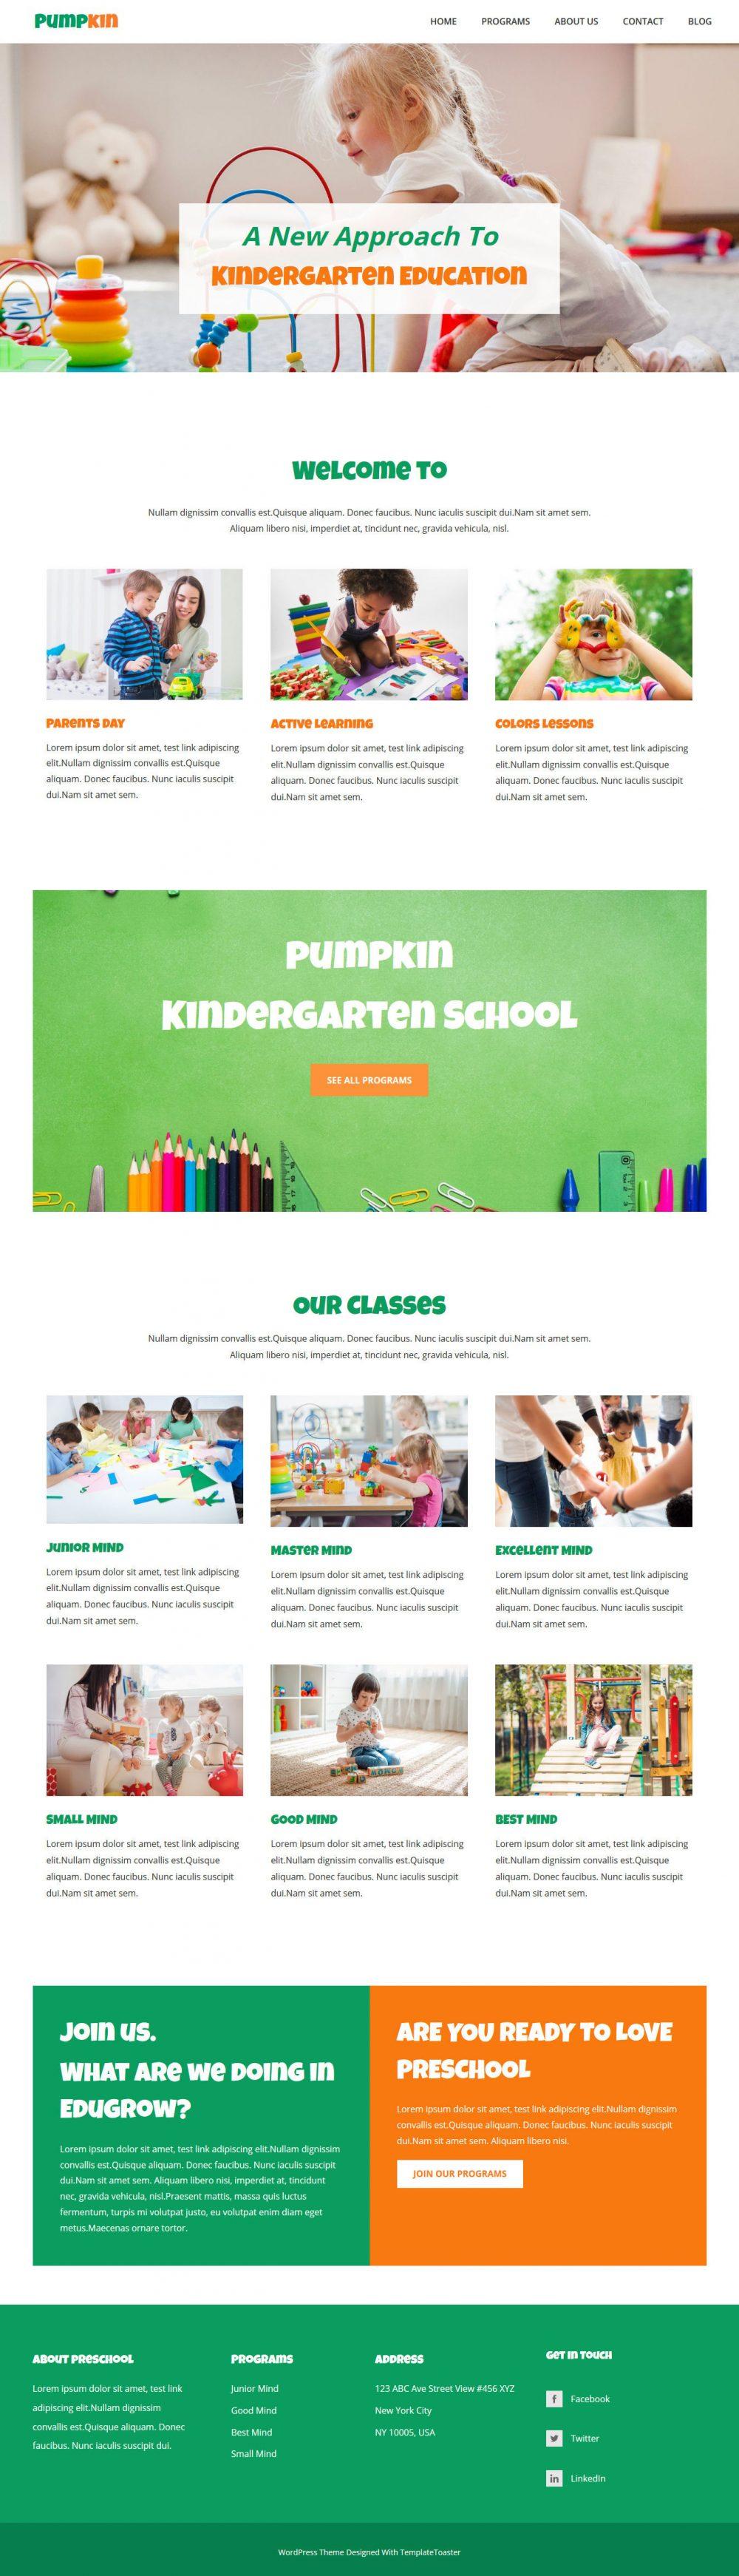 pumpkin kindergarten education drupal theme